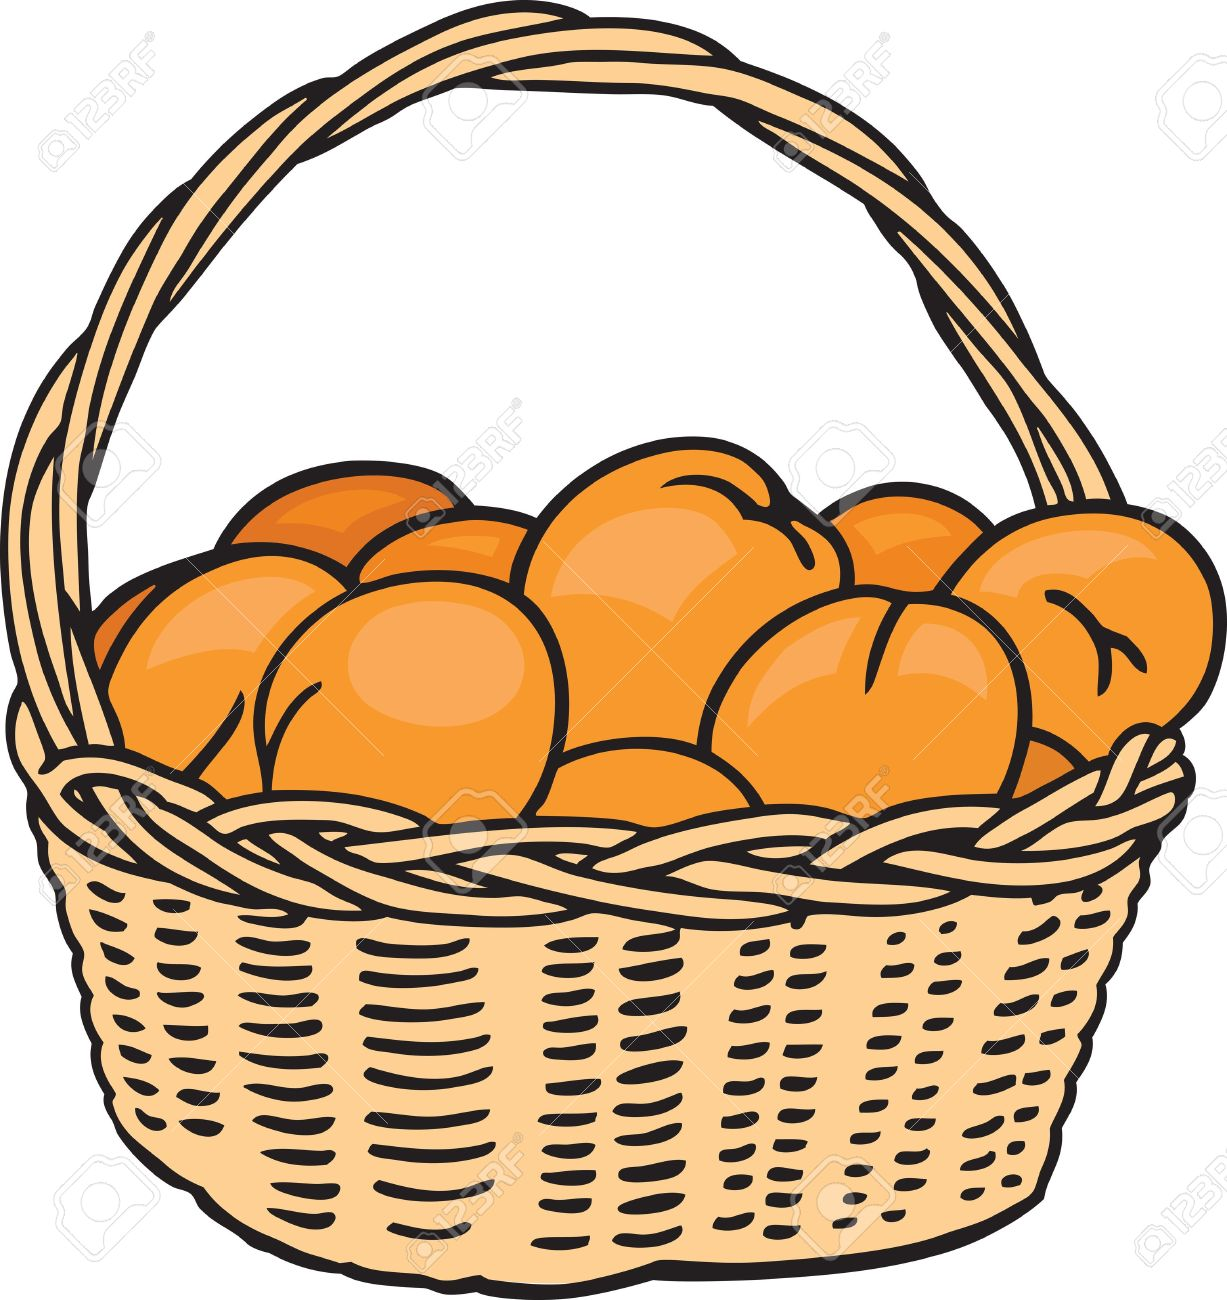 1227x1300 Clip Art Oranges Clip Art